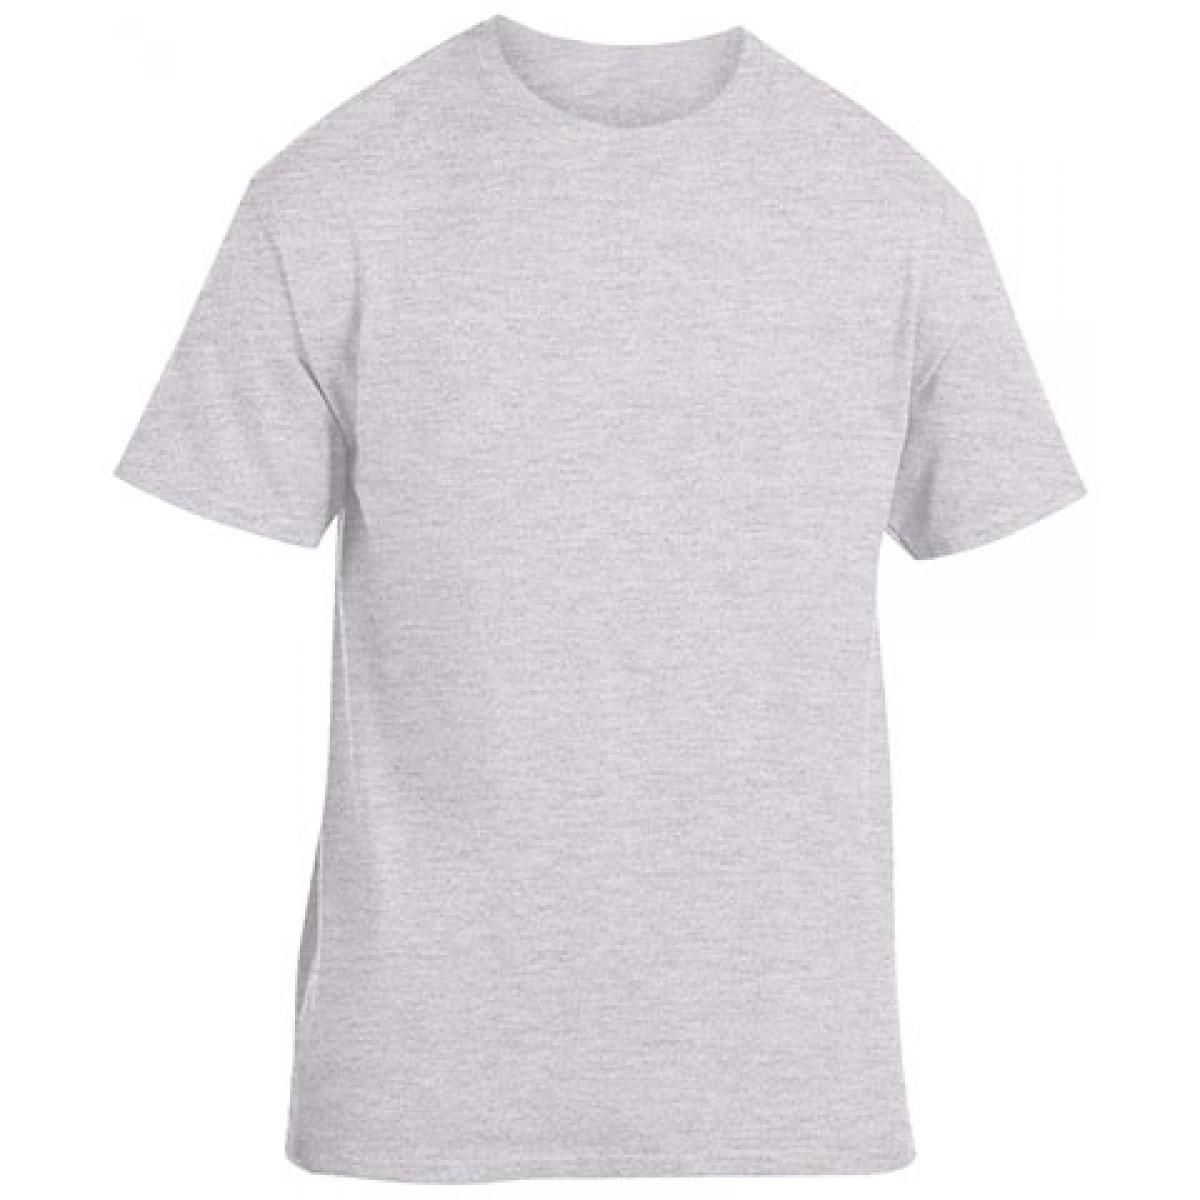 Cotton Short Sleeve T-Shirt-Sports Grey-M